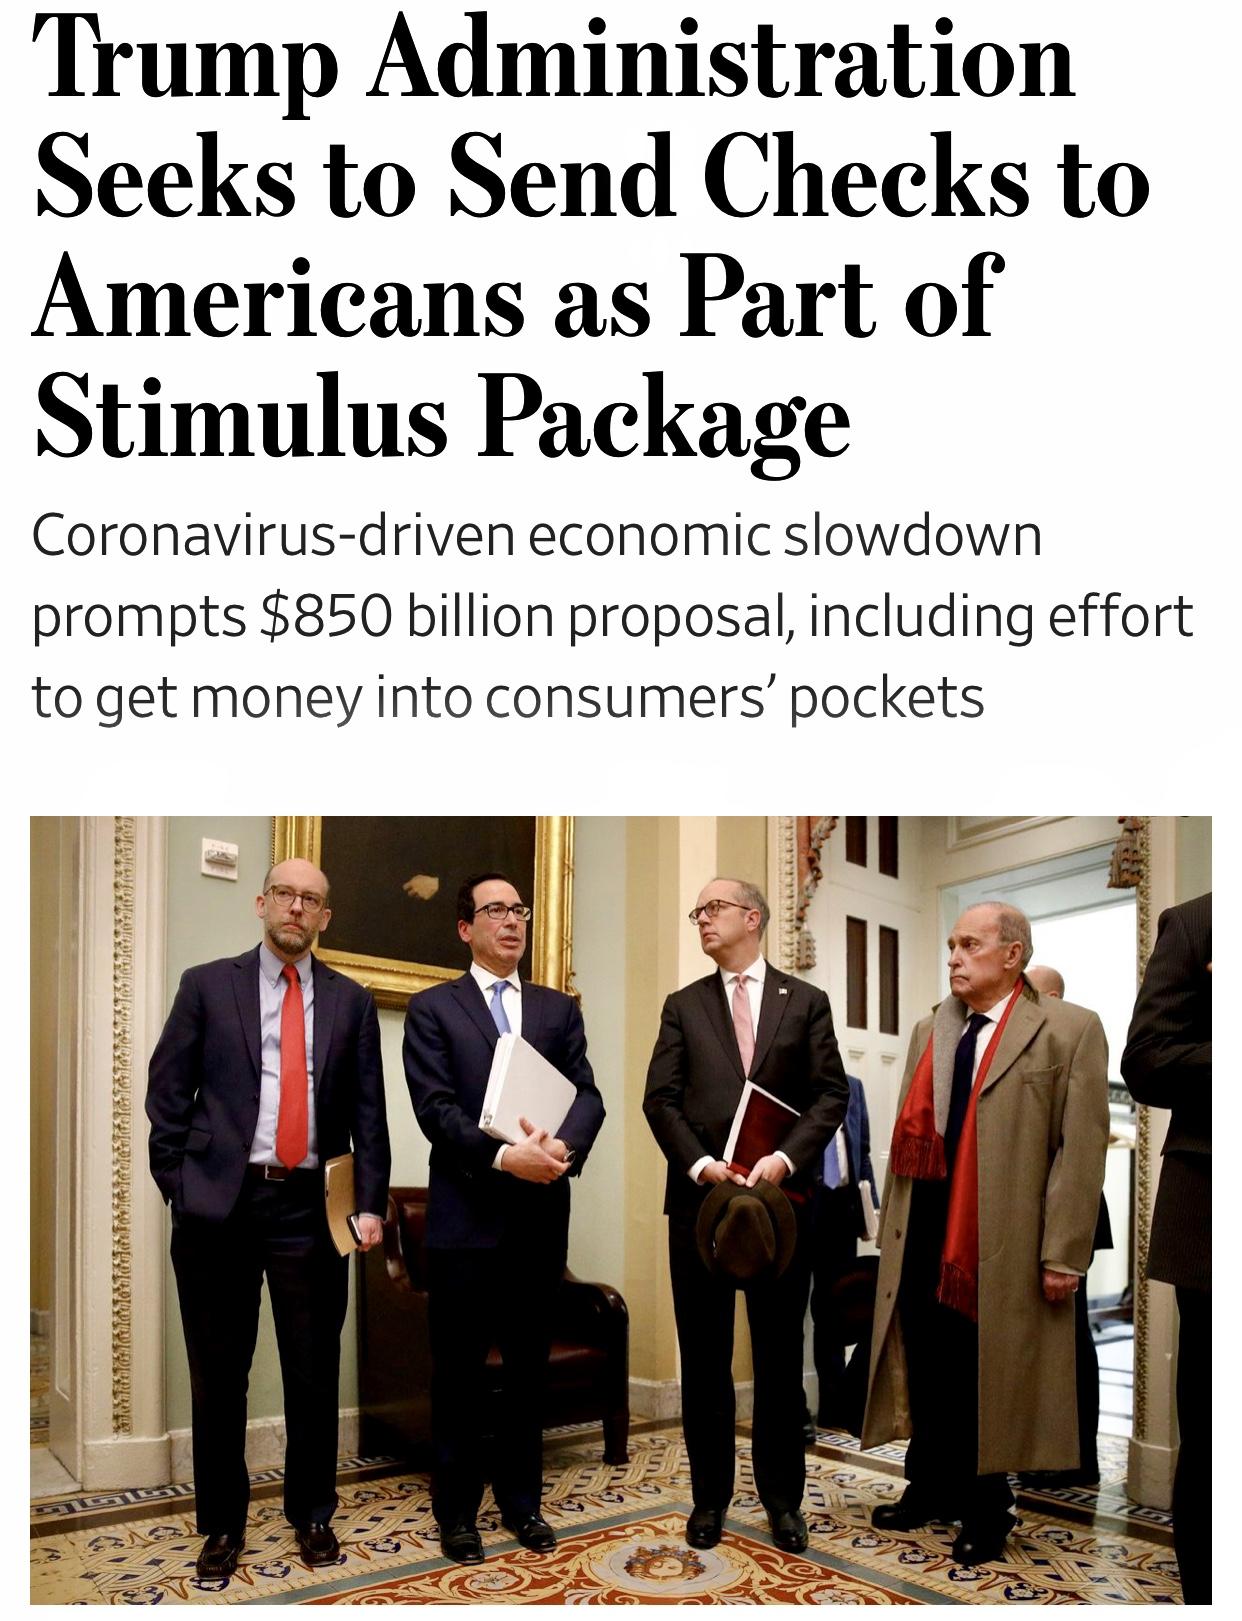 WH $850 Billion Stimulus Proposal to Send Checks to Americans